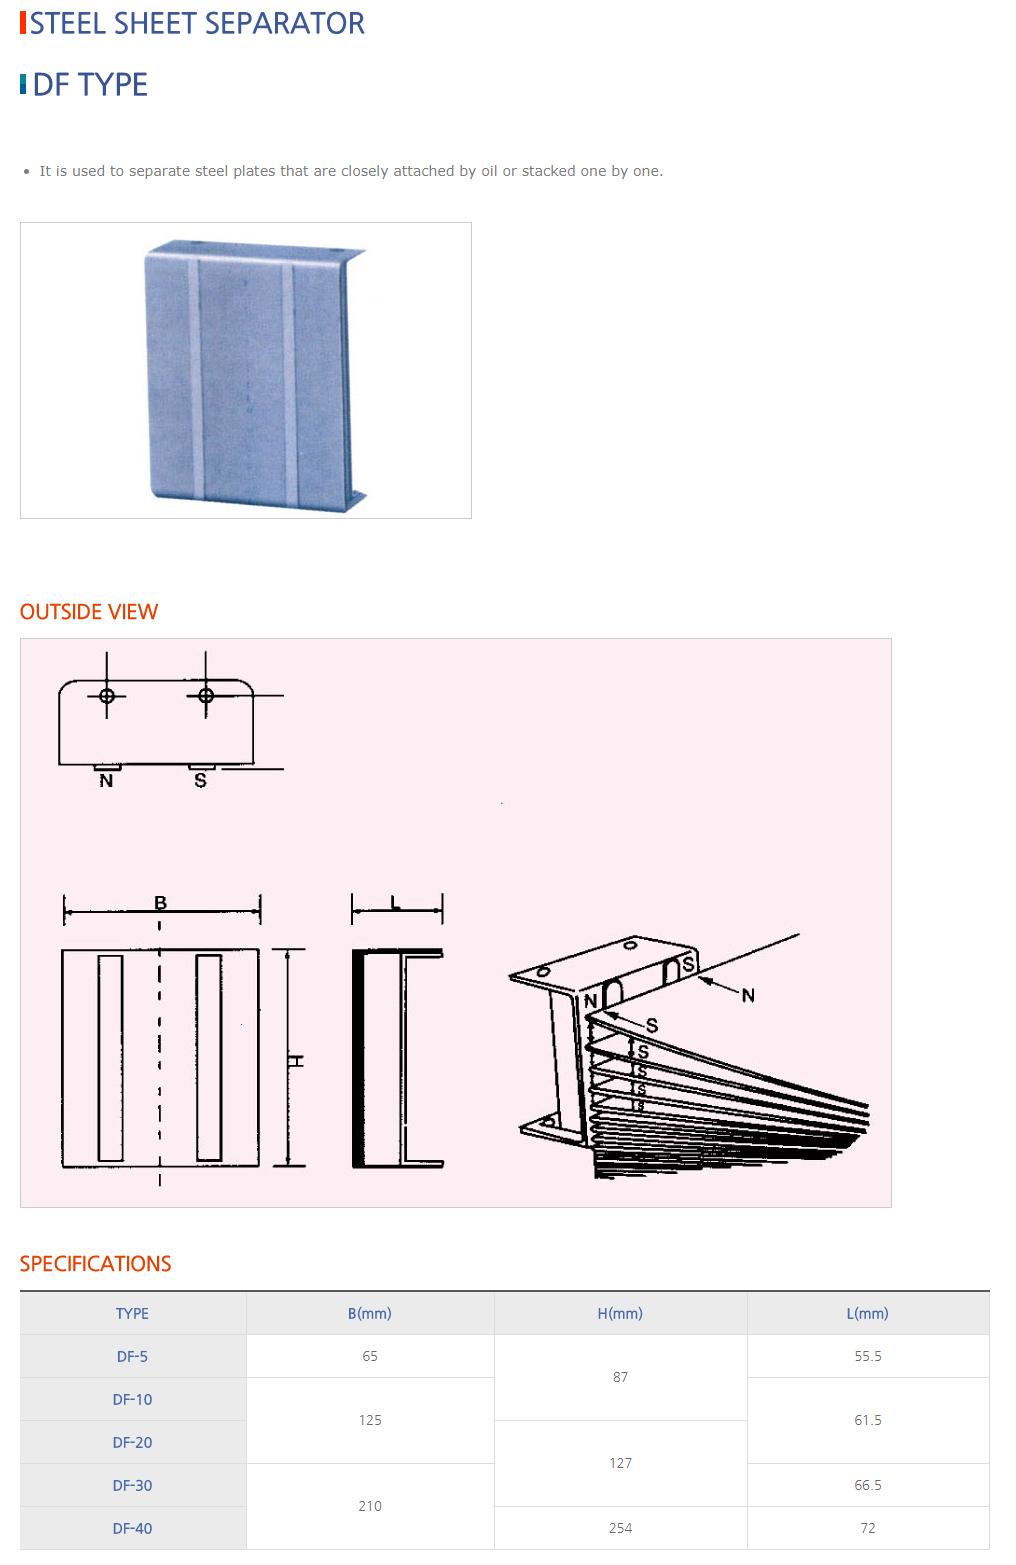 DAESUNG MARGNET Steel Sheet Separator DF Type